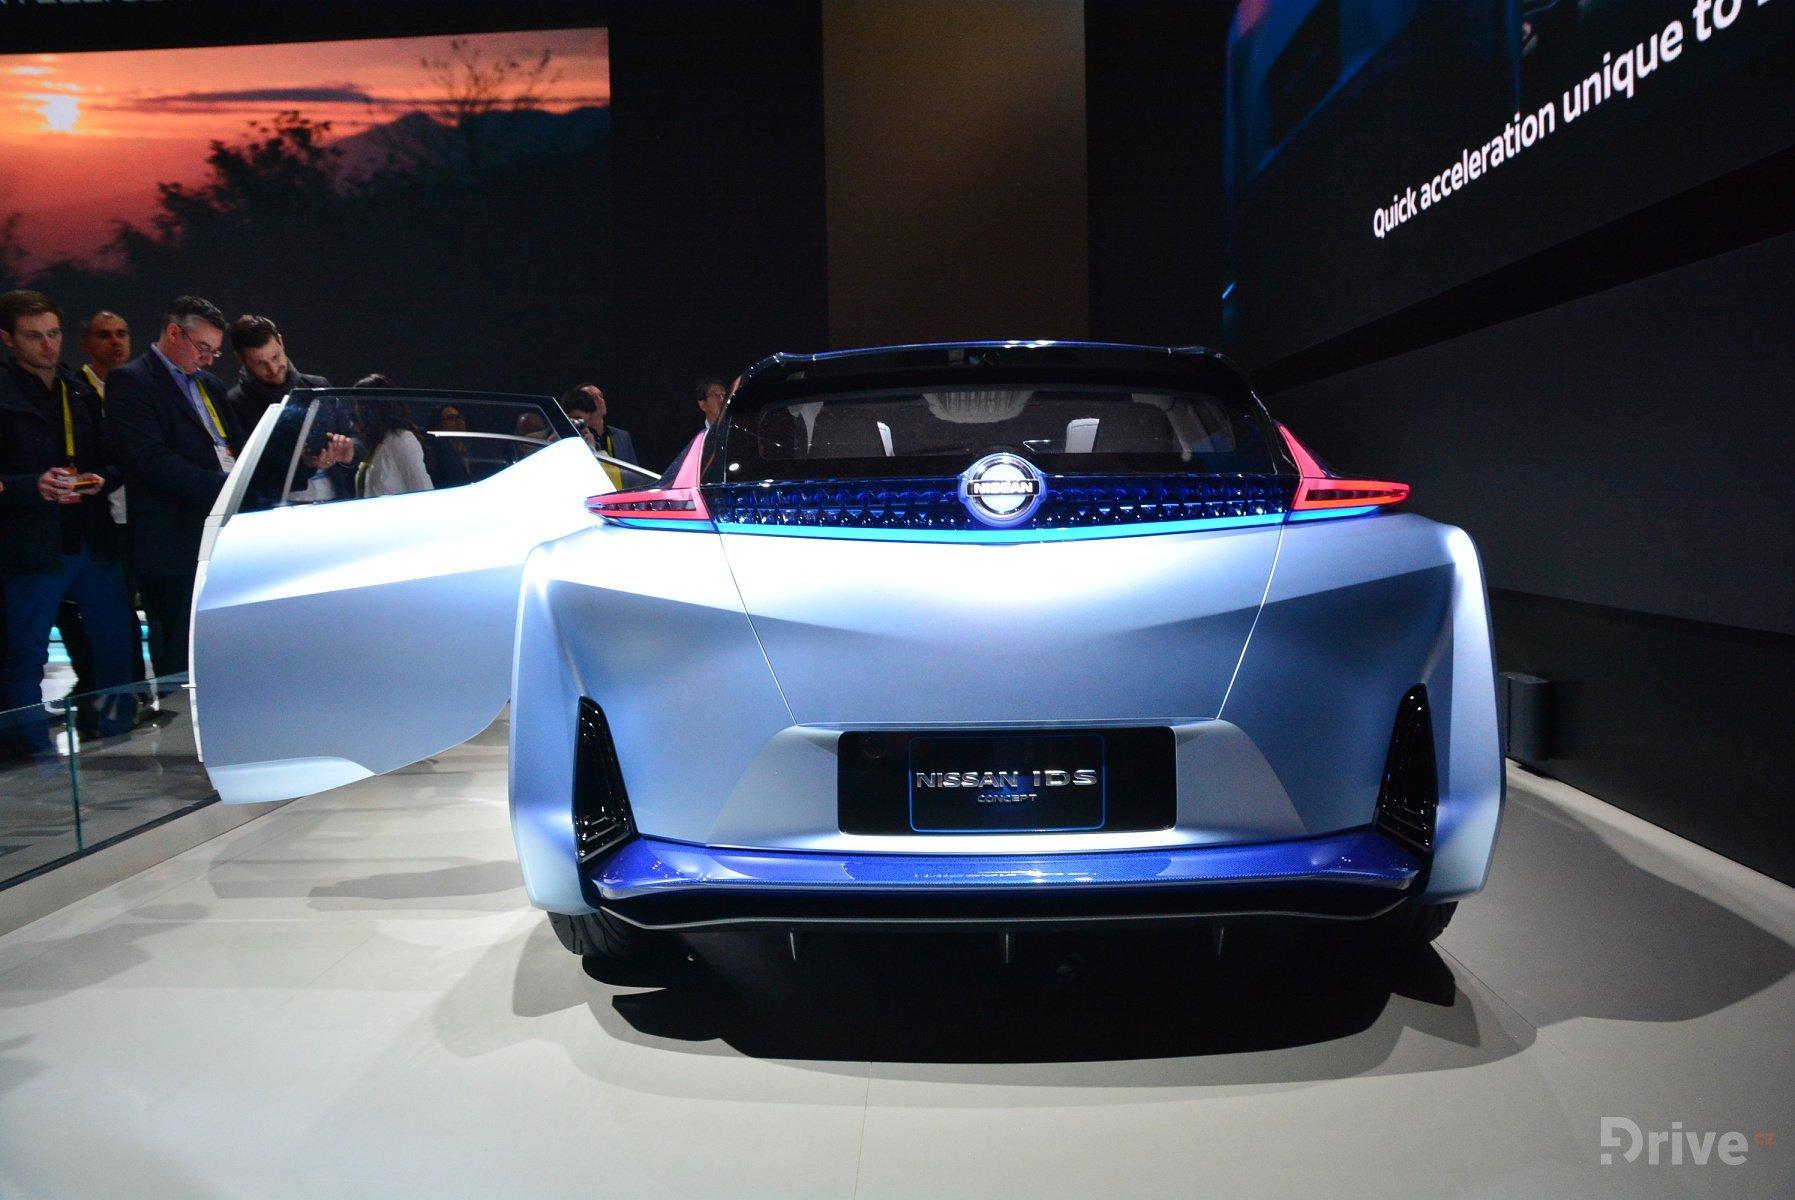 Nissan Intelligent Mobility koncept na veletrhu CES 2017